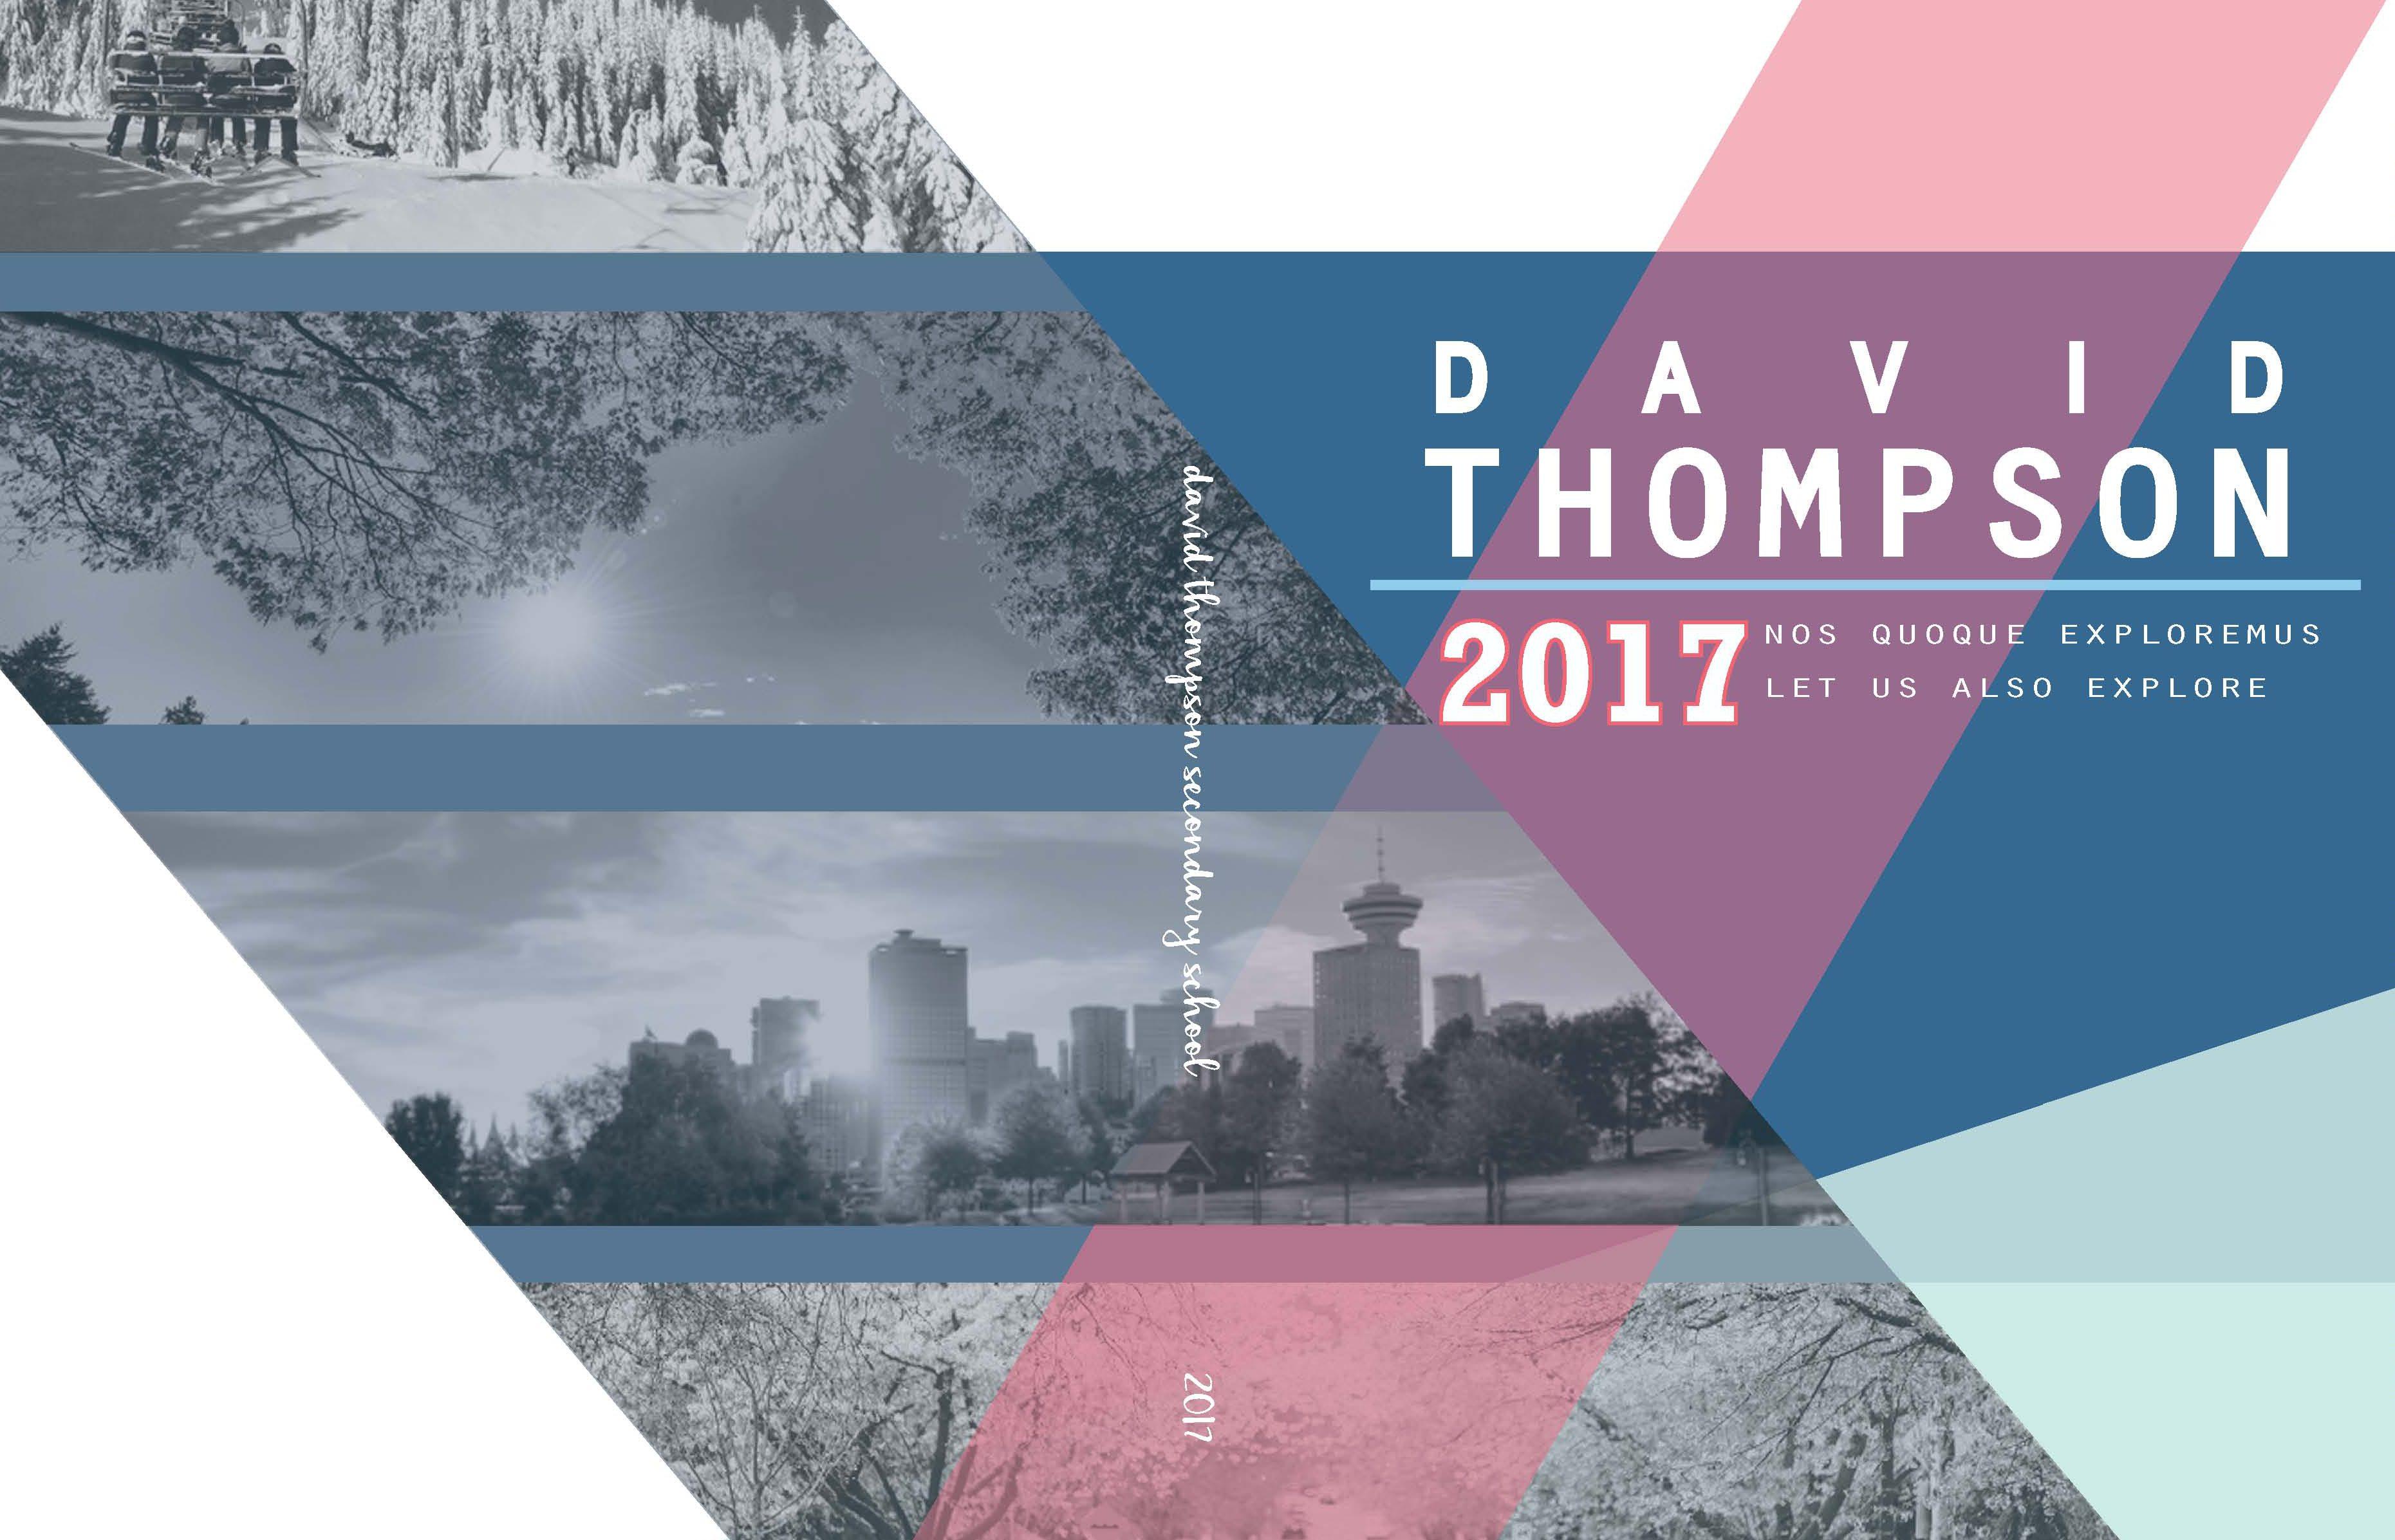 225627-2 David Thompson